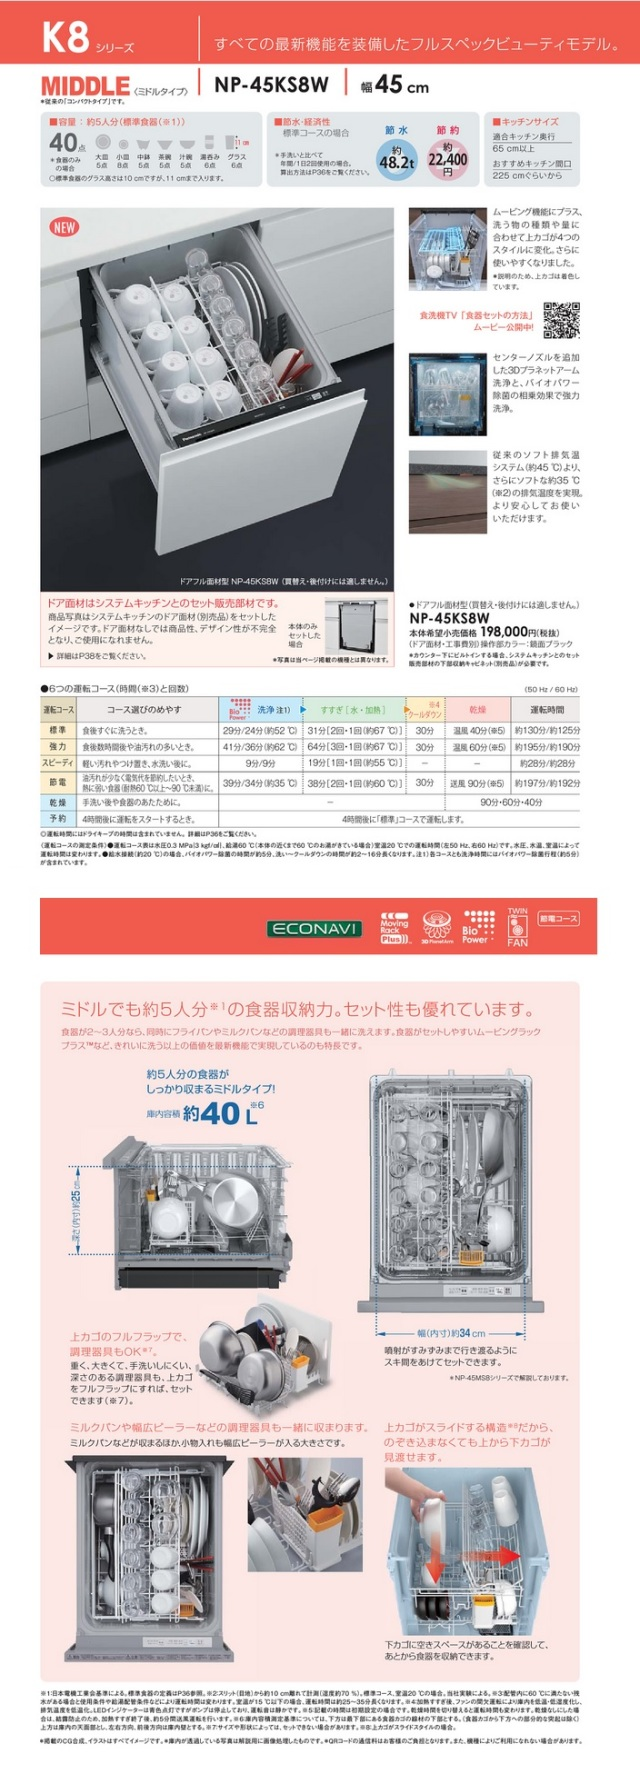 Panasonic ビルトイン食器洗い乾燥機 KS8W 商品説明